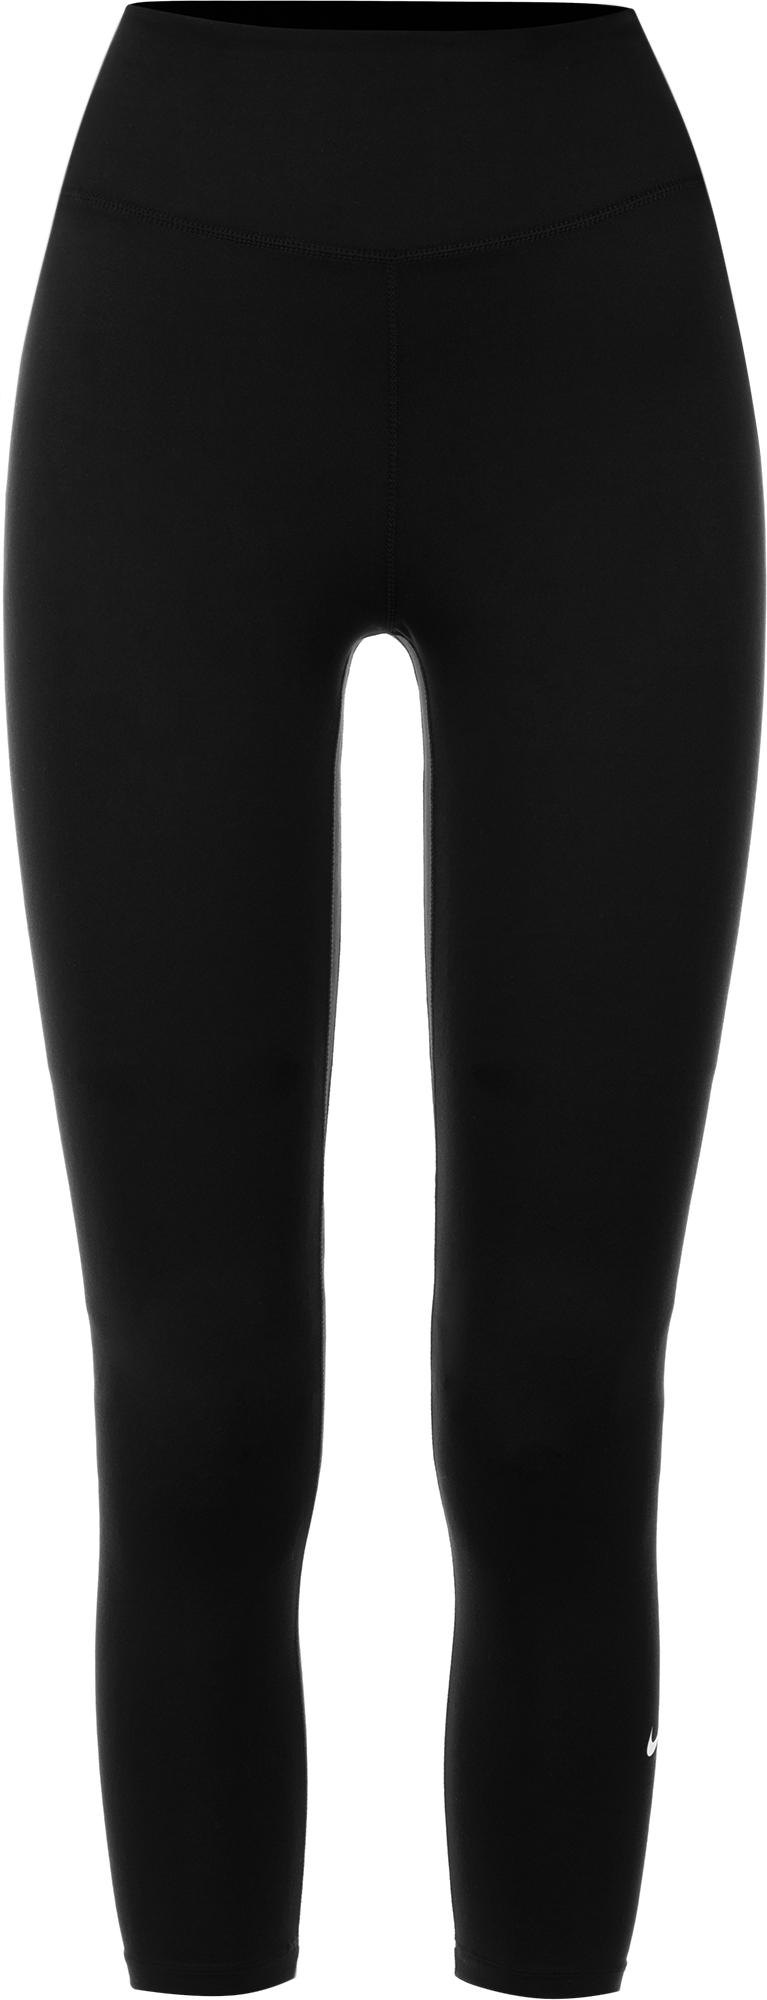 Nike Бриджи женские Nike All-In, размер 48-50 nike бриджи женские nike sportswear vintage размер 48 50